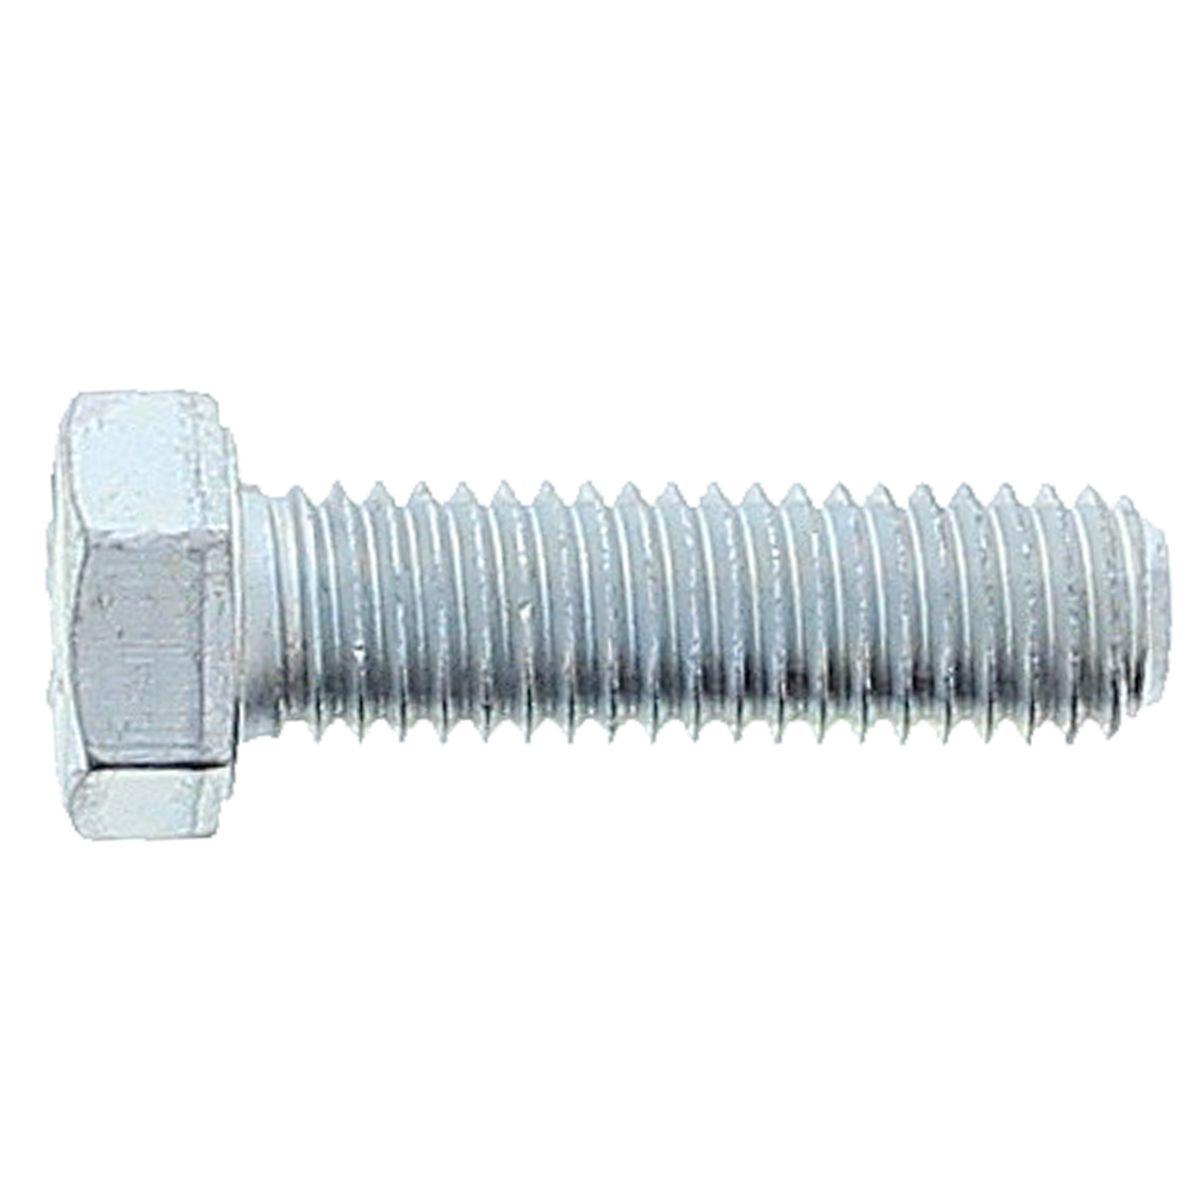 "1""-8 x 2-1/2"" Hex Cap Screws — SAE J429 Grade 5, Coarse Thread, Zinc, 1/PKG"